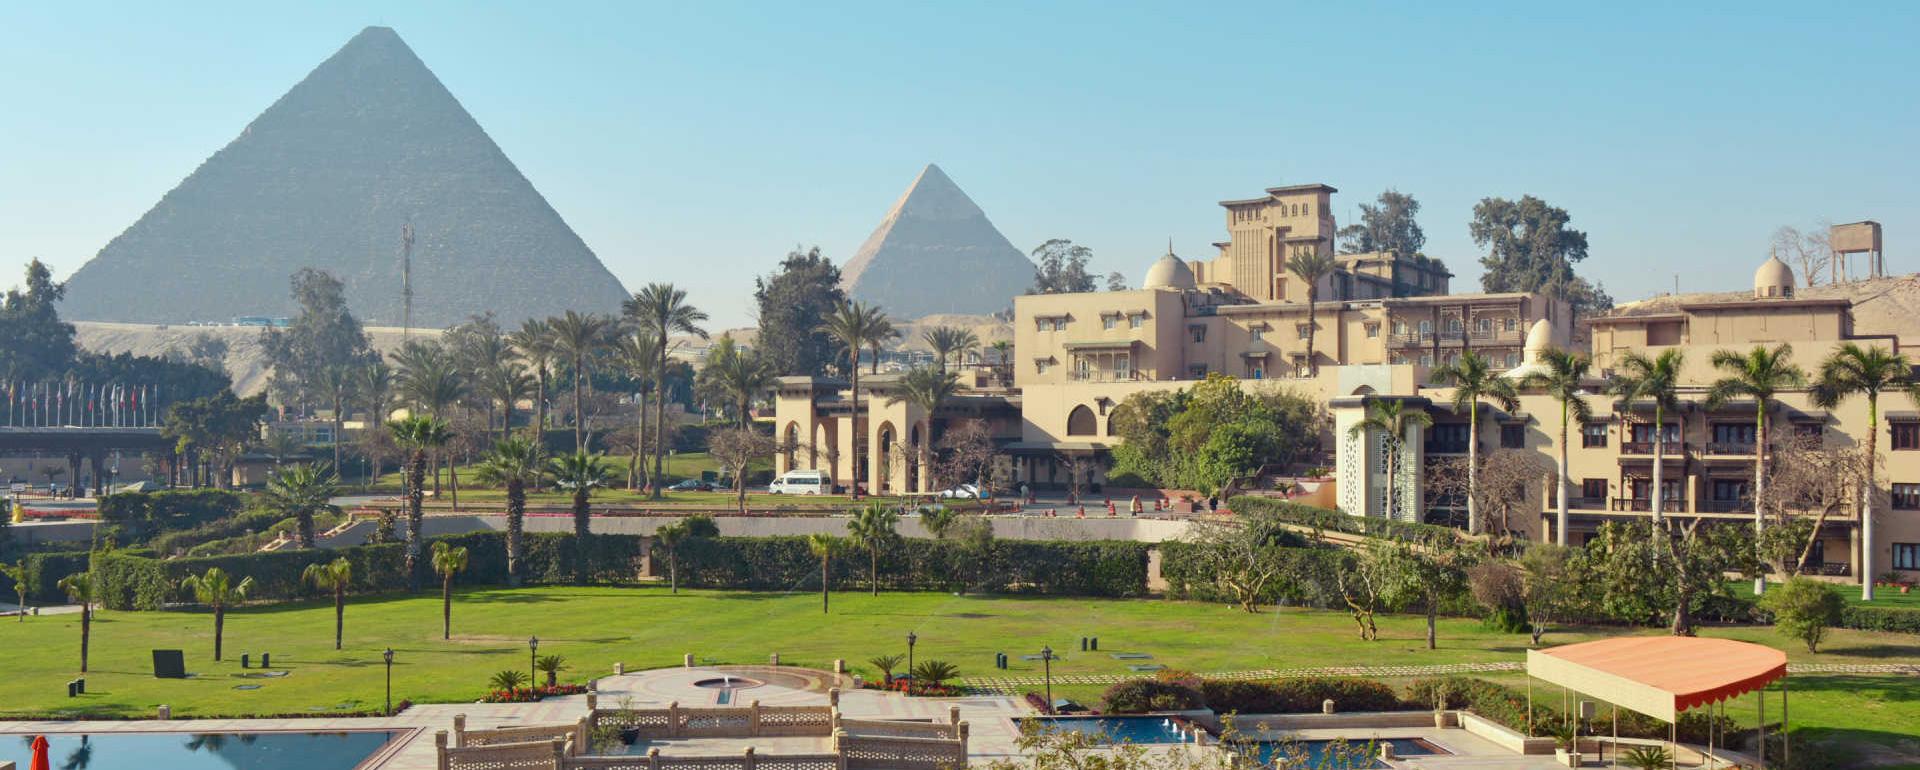 Pyramids Museum History Pharo Pharonic Egypt Cairo Luxor Aswan Nil Papyrus Perfume Shopping Kartush Gold Silver Treasure Museum Mask